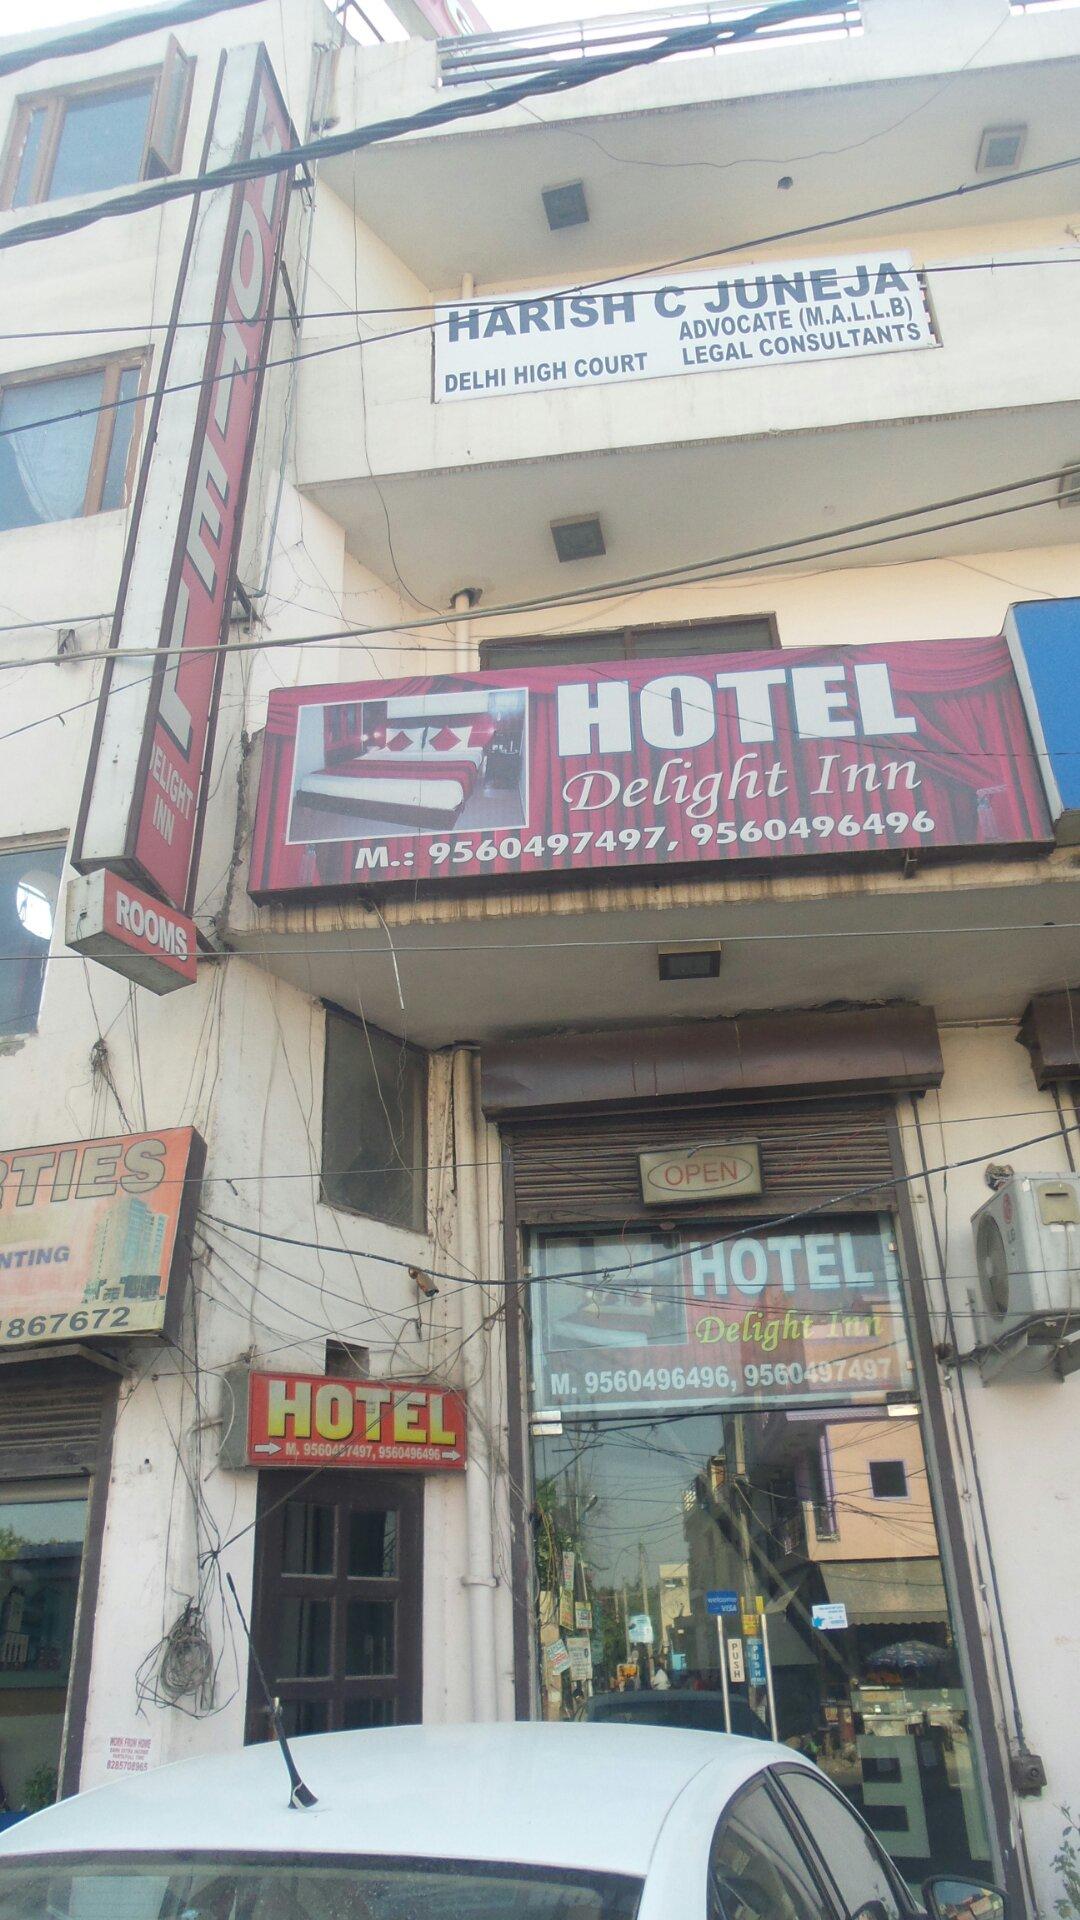 Hotel Delight Inn in New Delhi